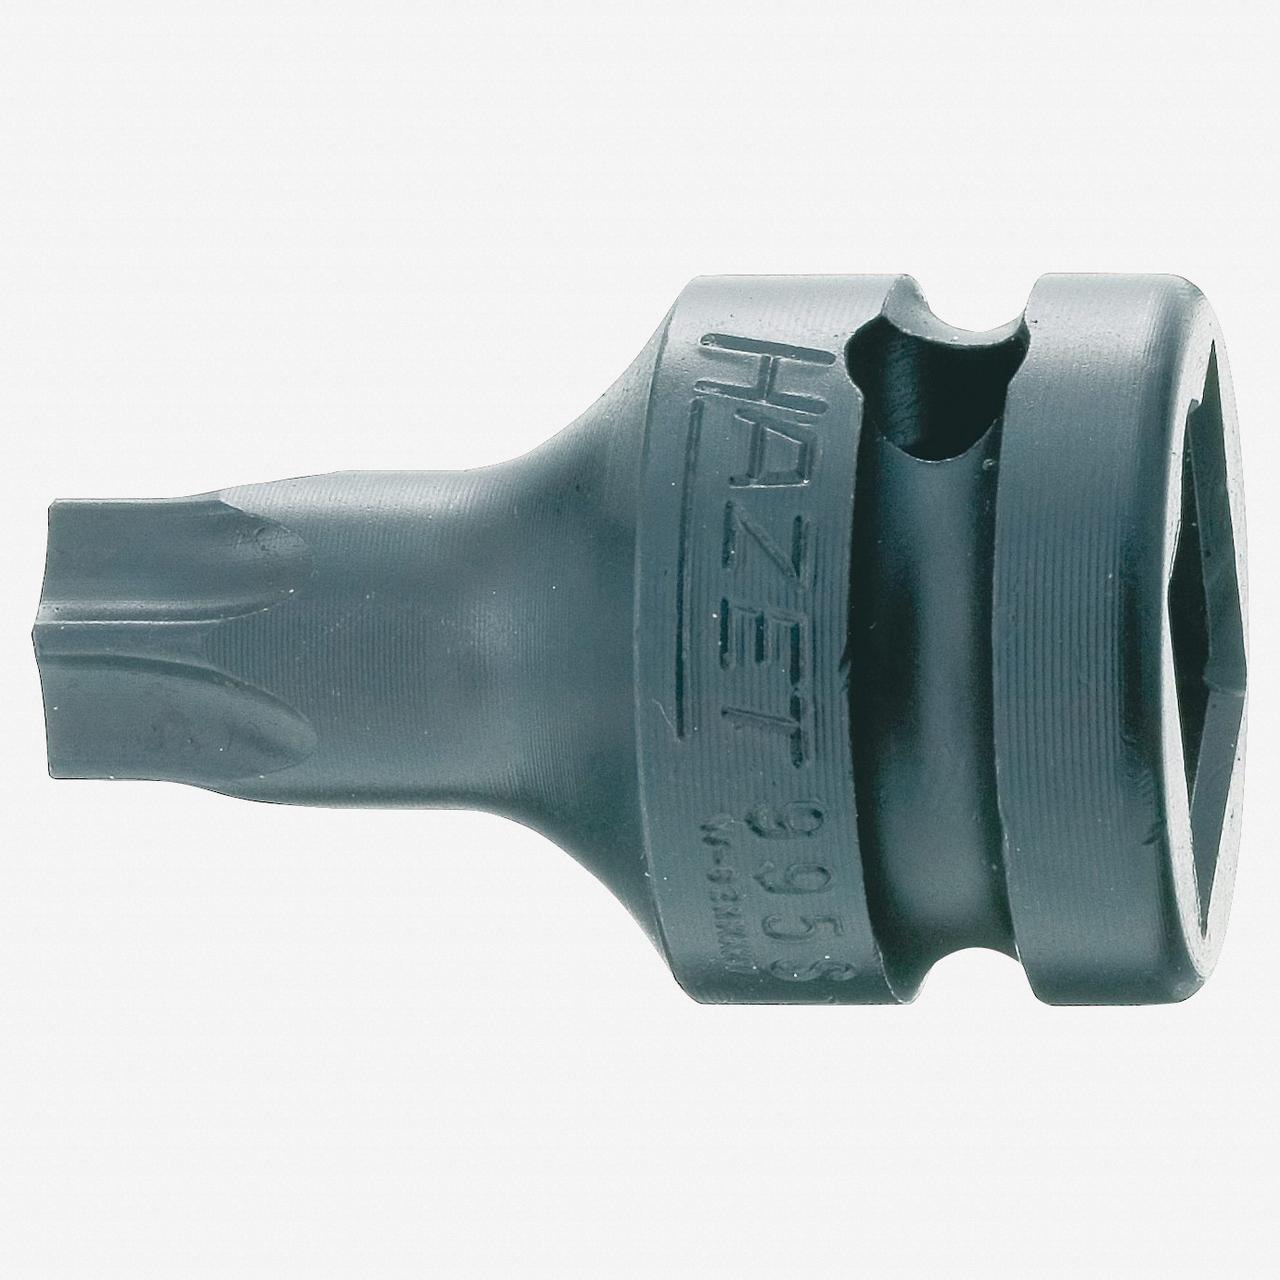 "Hazet 995S-T55 T55 Torx Impact Socket 1/2"" - KC Tool"